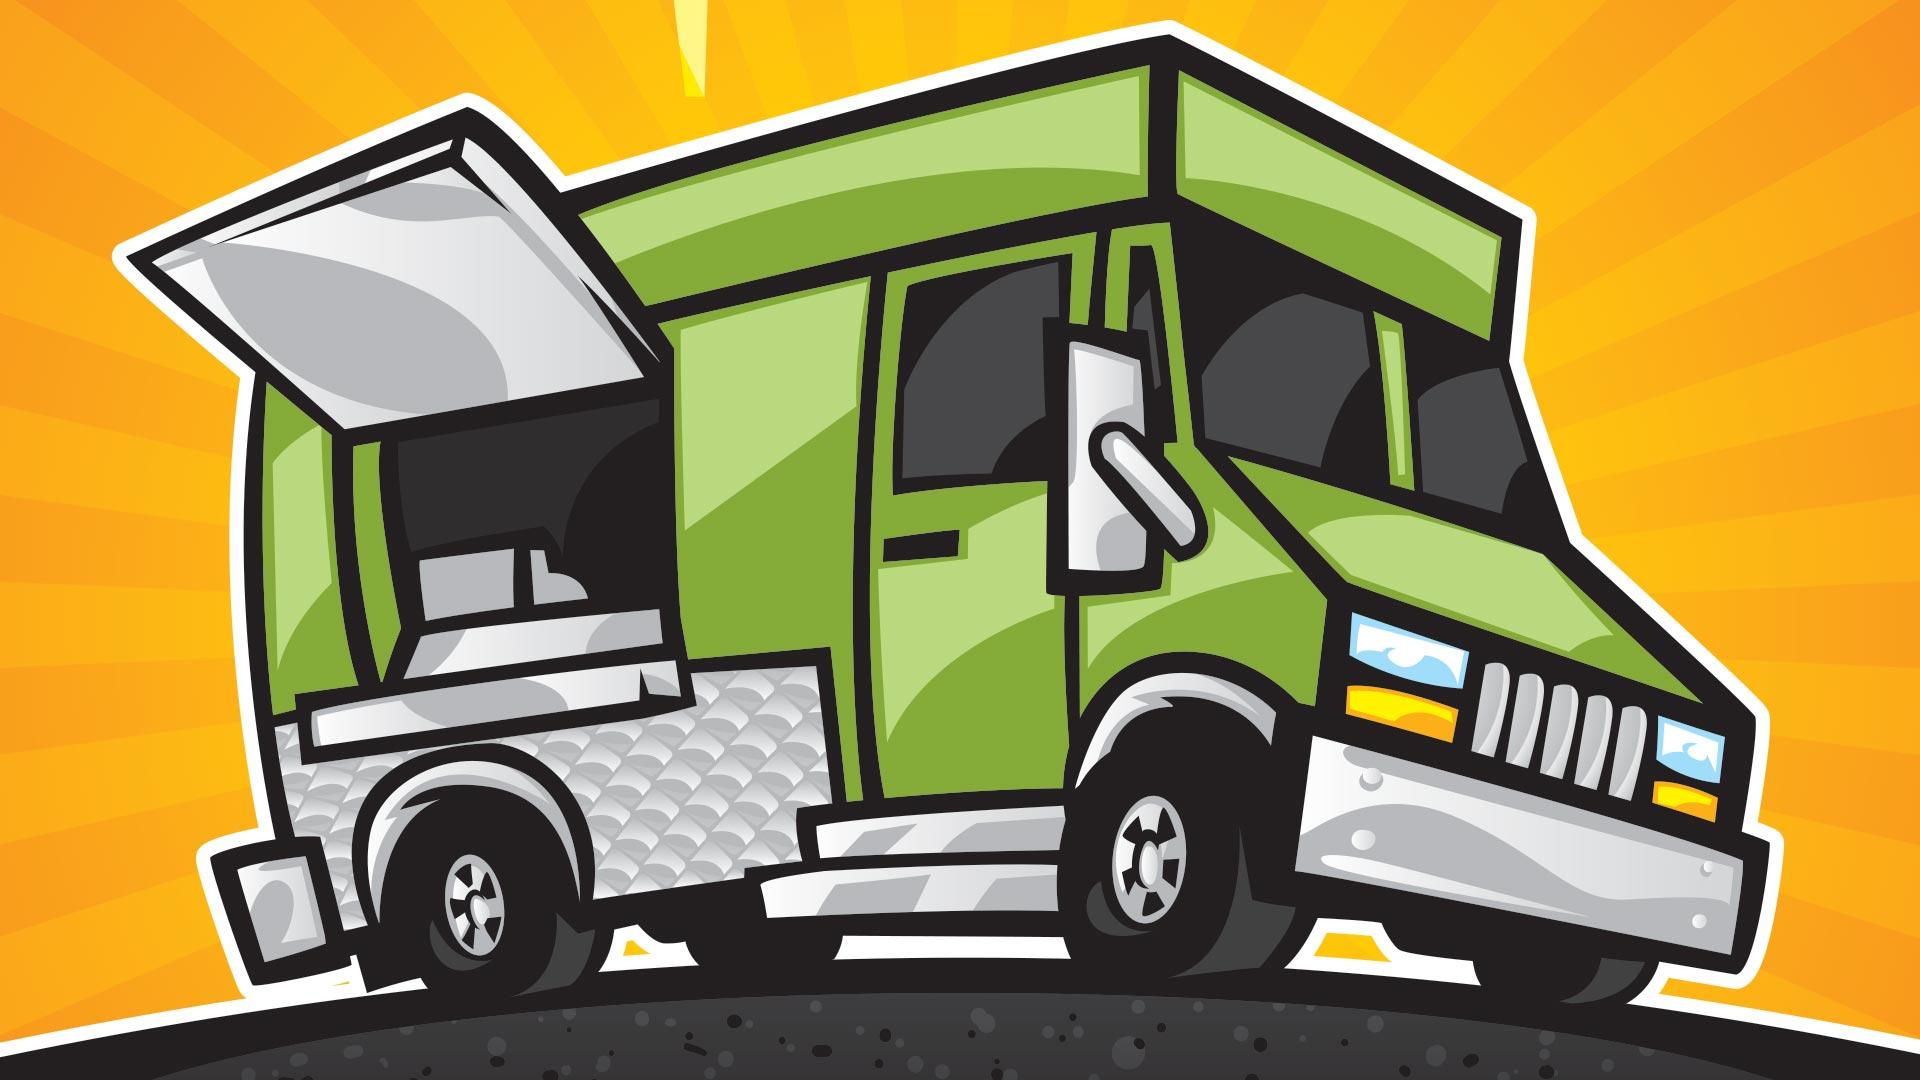 Clip art of green food truck